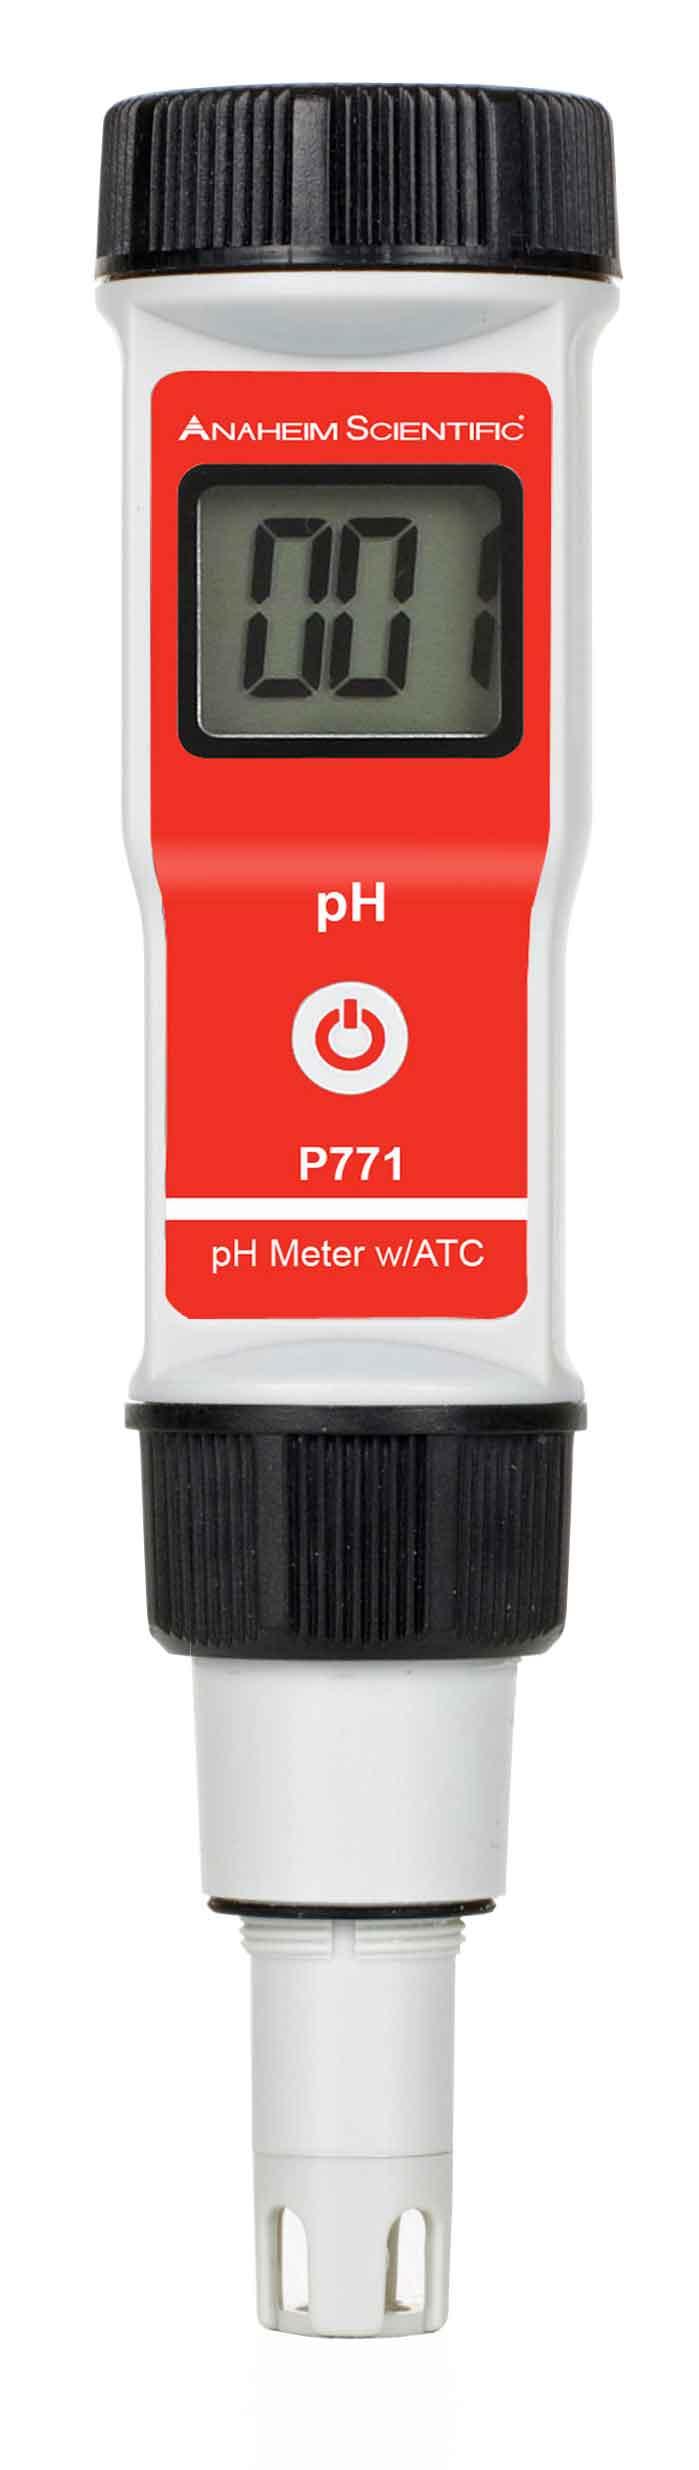 Global Specialties P771 pH Meter with ATC Photo